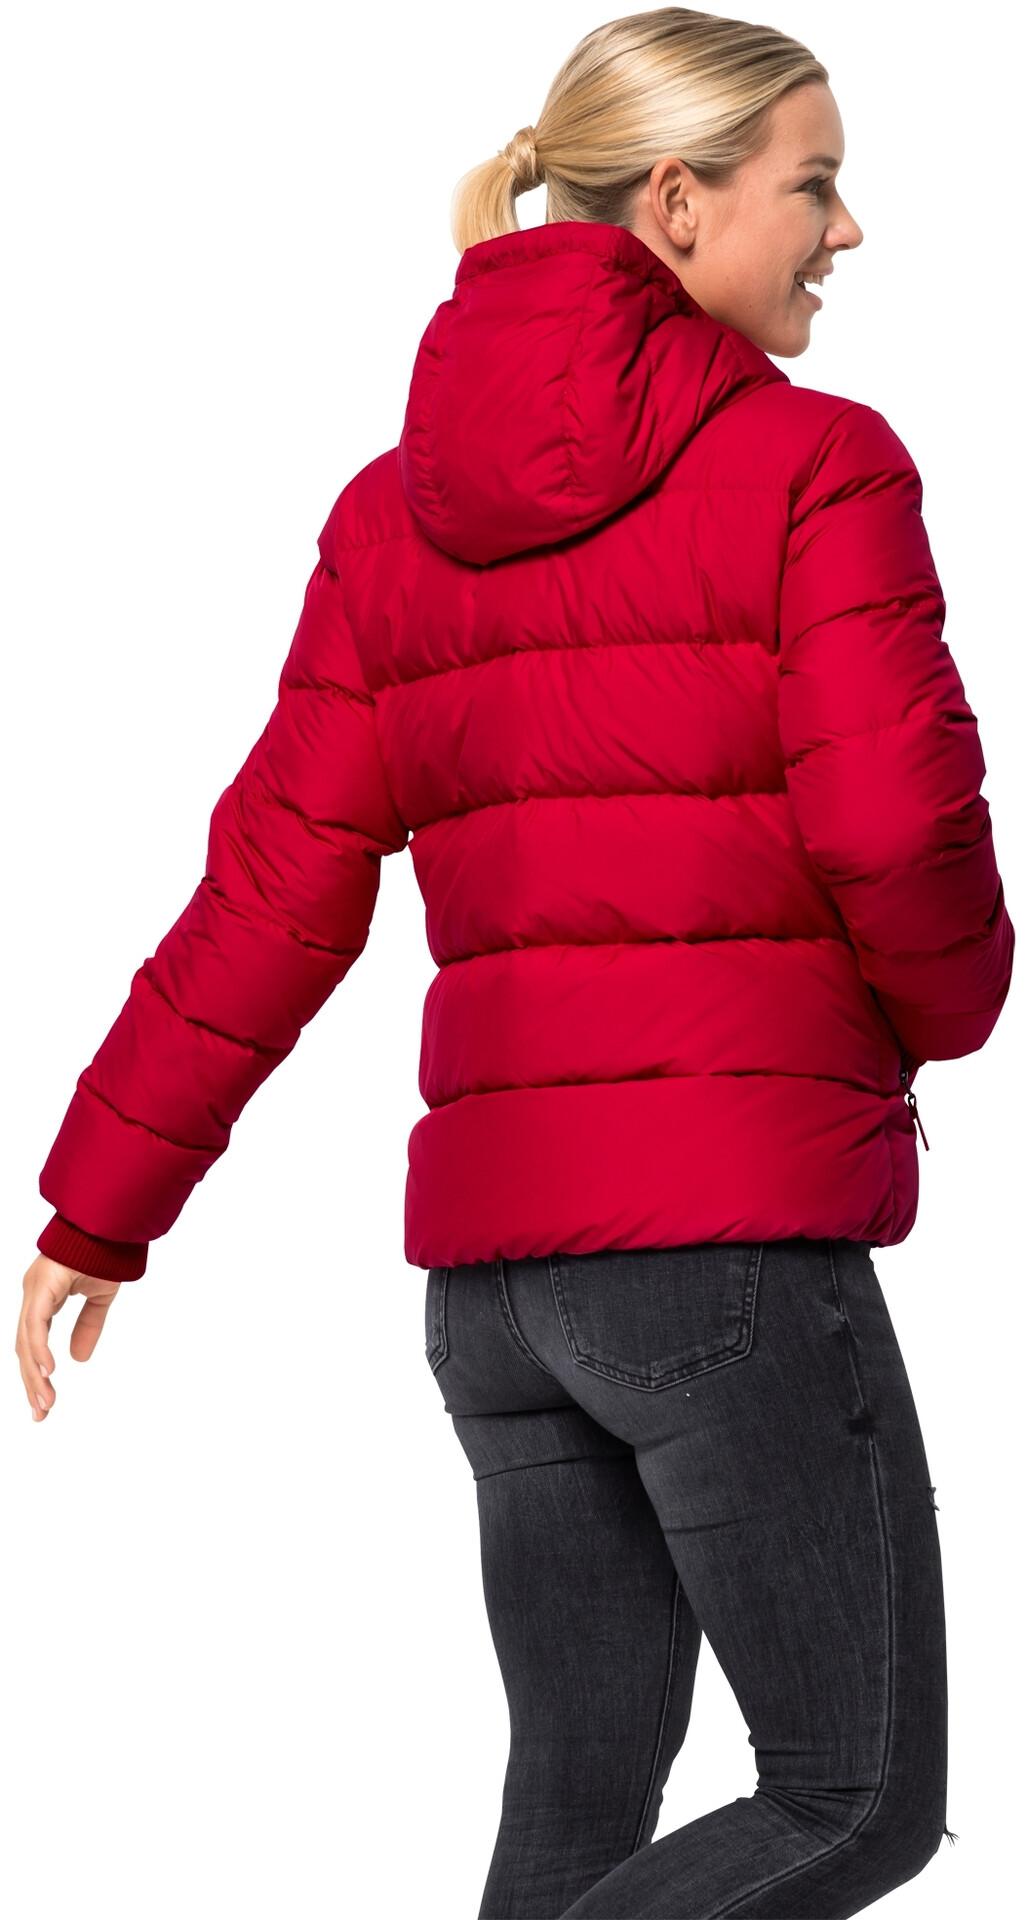 Jack Wolfskin Crystal Palace Veste Femme, ruby red sur CAMPZ